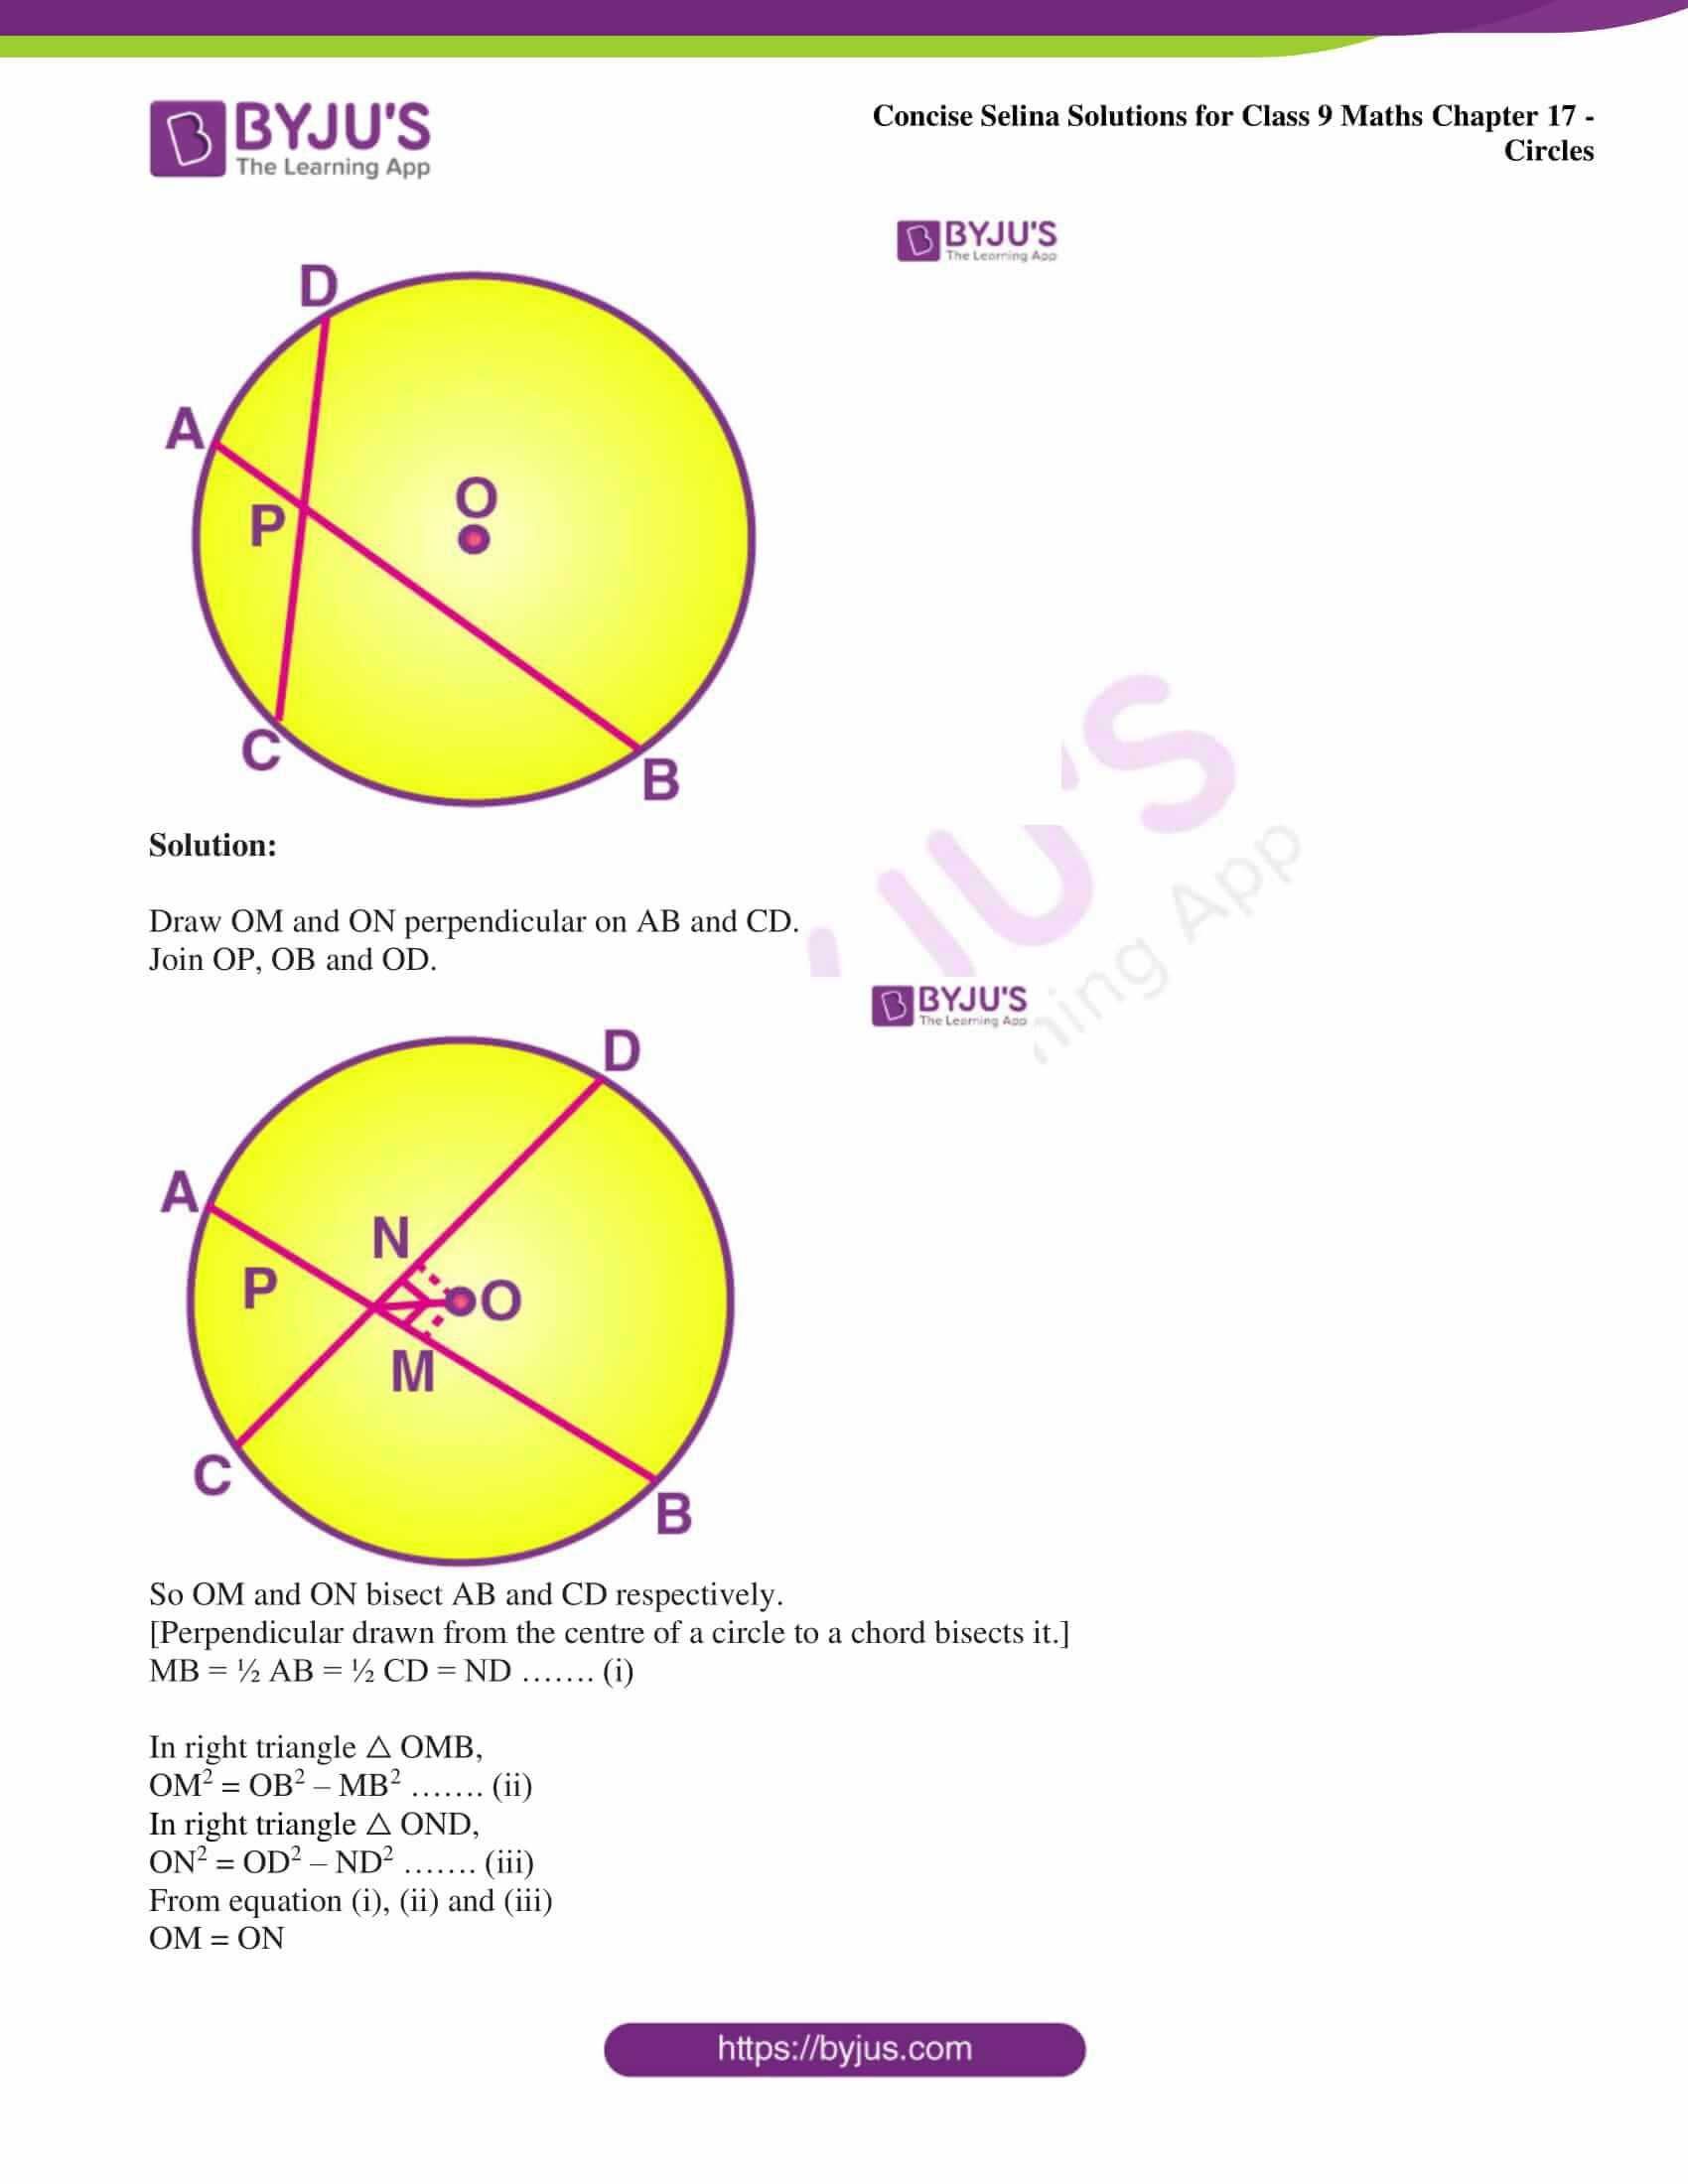 icse class 9 maths may10 selina solutions chapter 17 circles 11